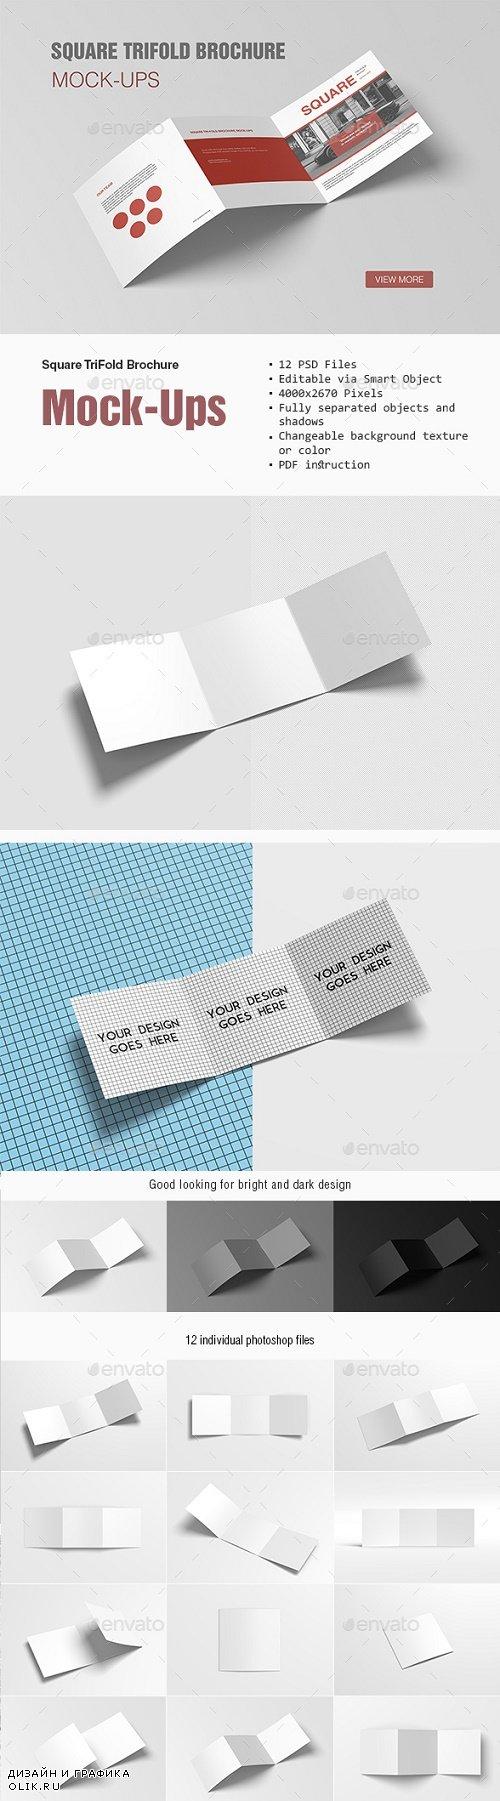 Square TriFold Brochure Mockup - 23525982 - 2744740